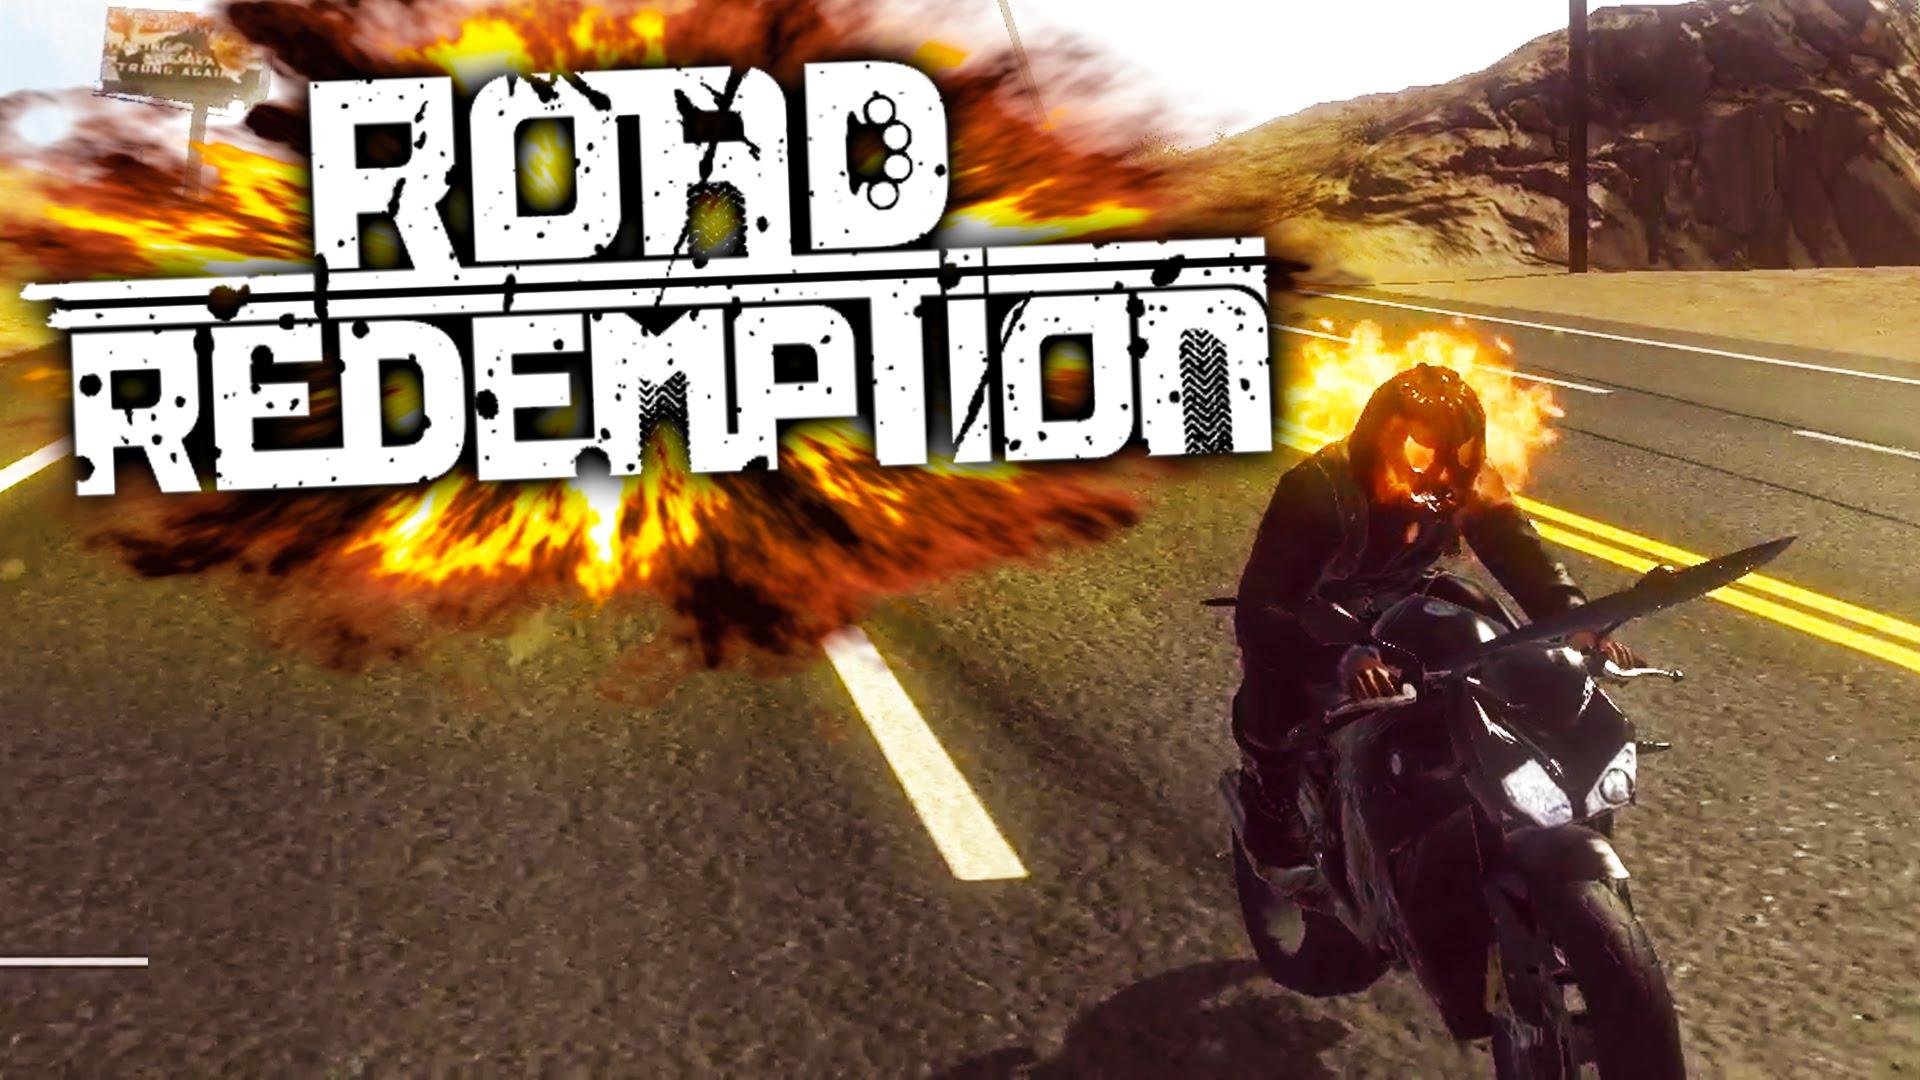 Road Redemption (Road Rash) Steam Sale - £10.49